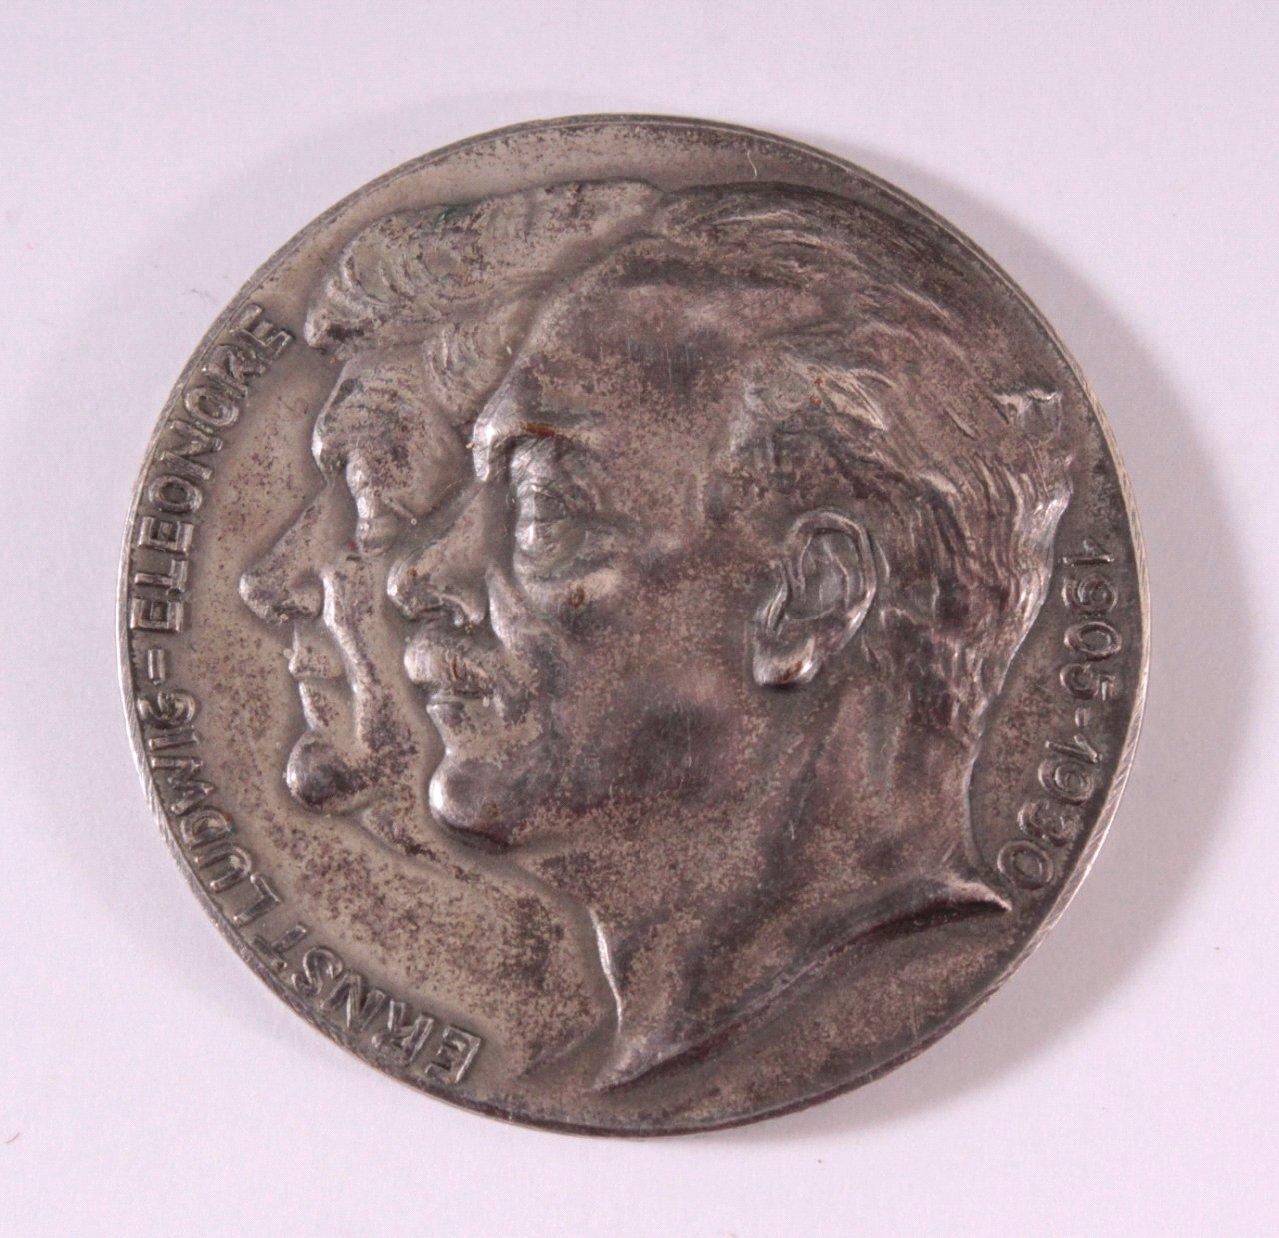 Silbermedaille Ernst-Ludwig Eleonore 1905-1930